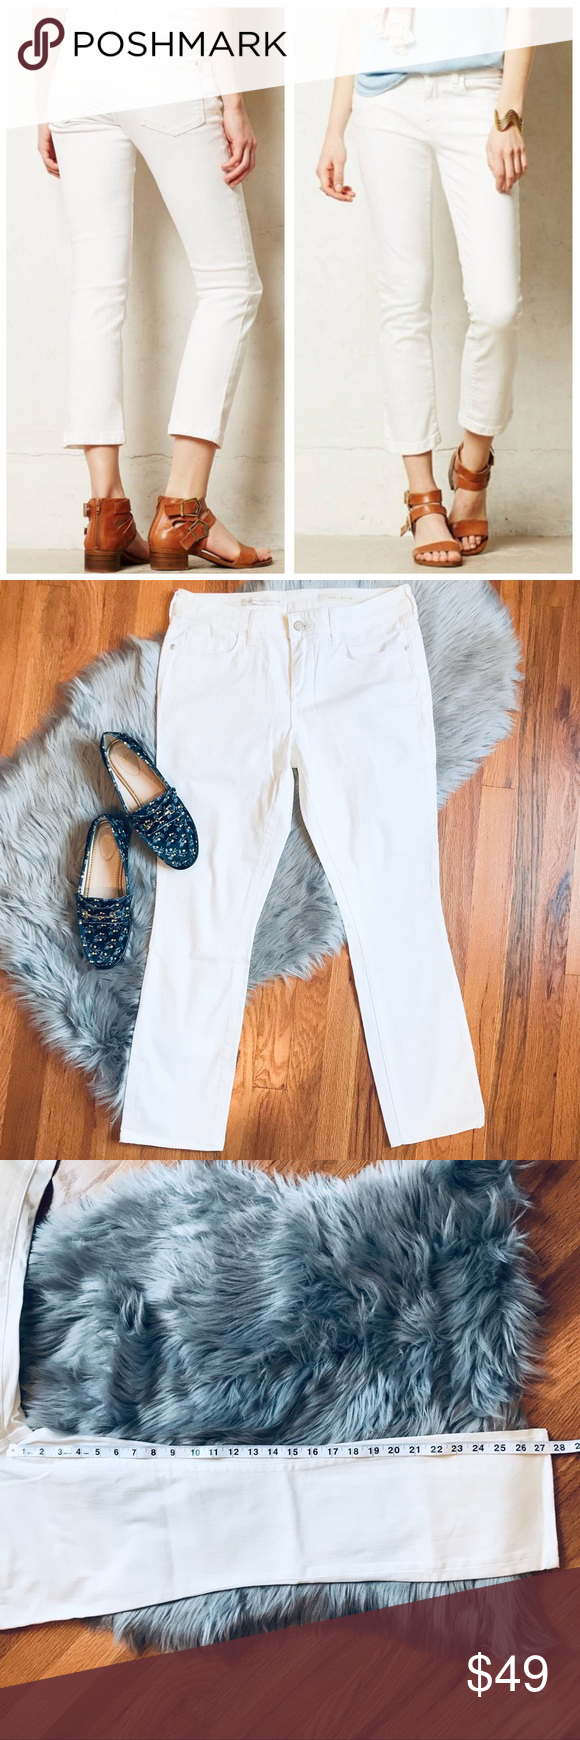 Anthropologie Pilcro Stet White Crop Jean Jeans from ...